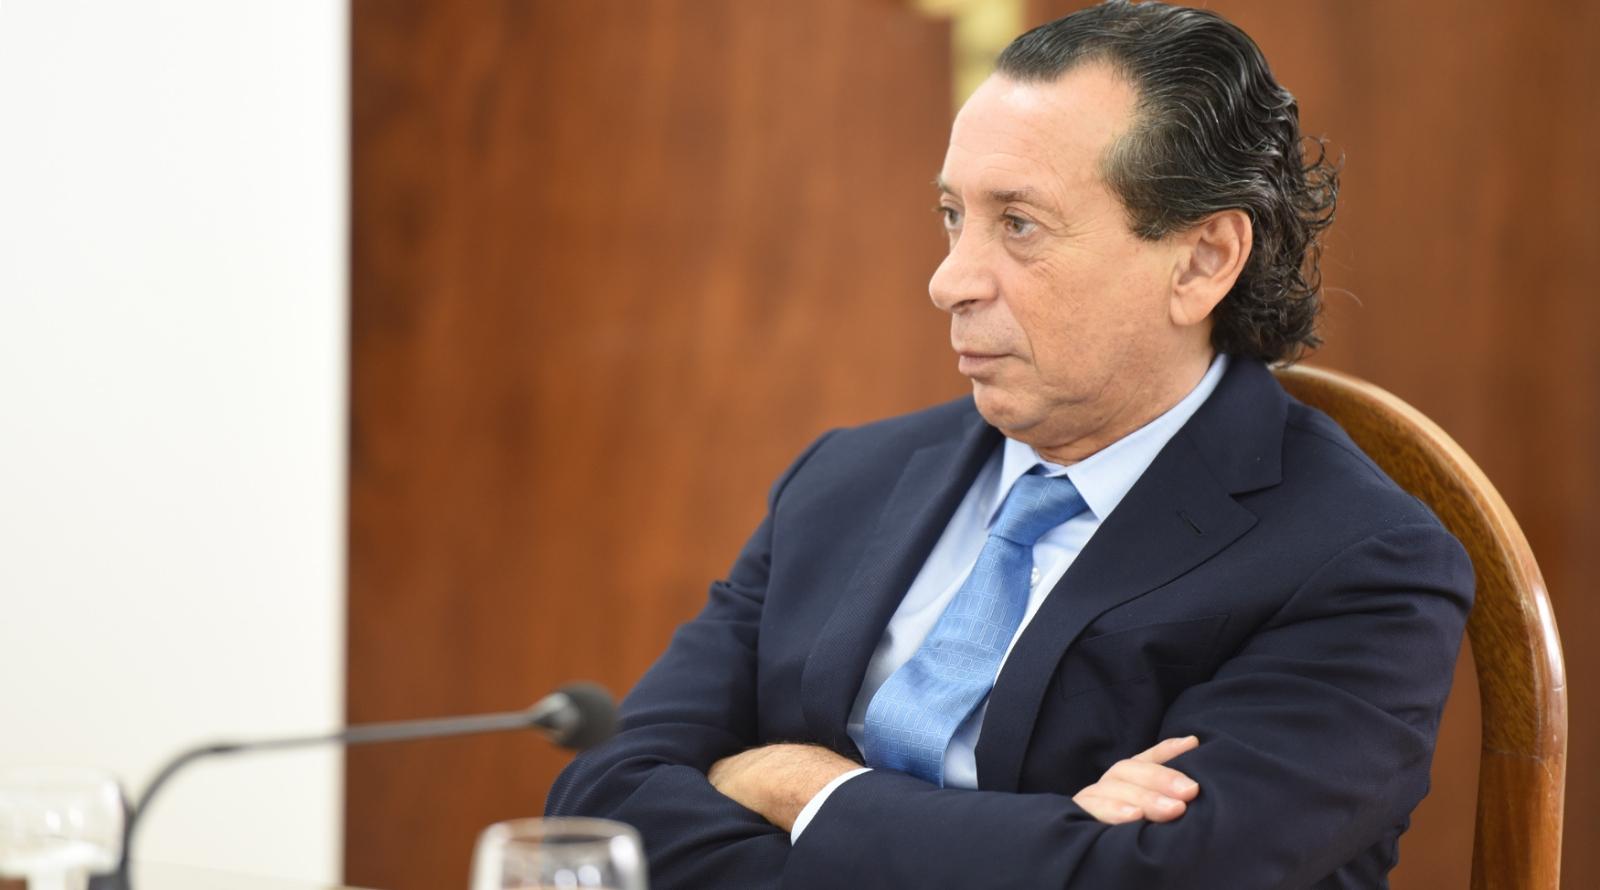 Imputaron al exministro Sica por subsidios irregulares